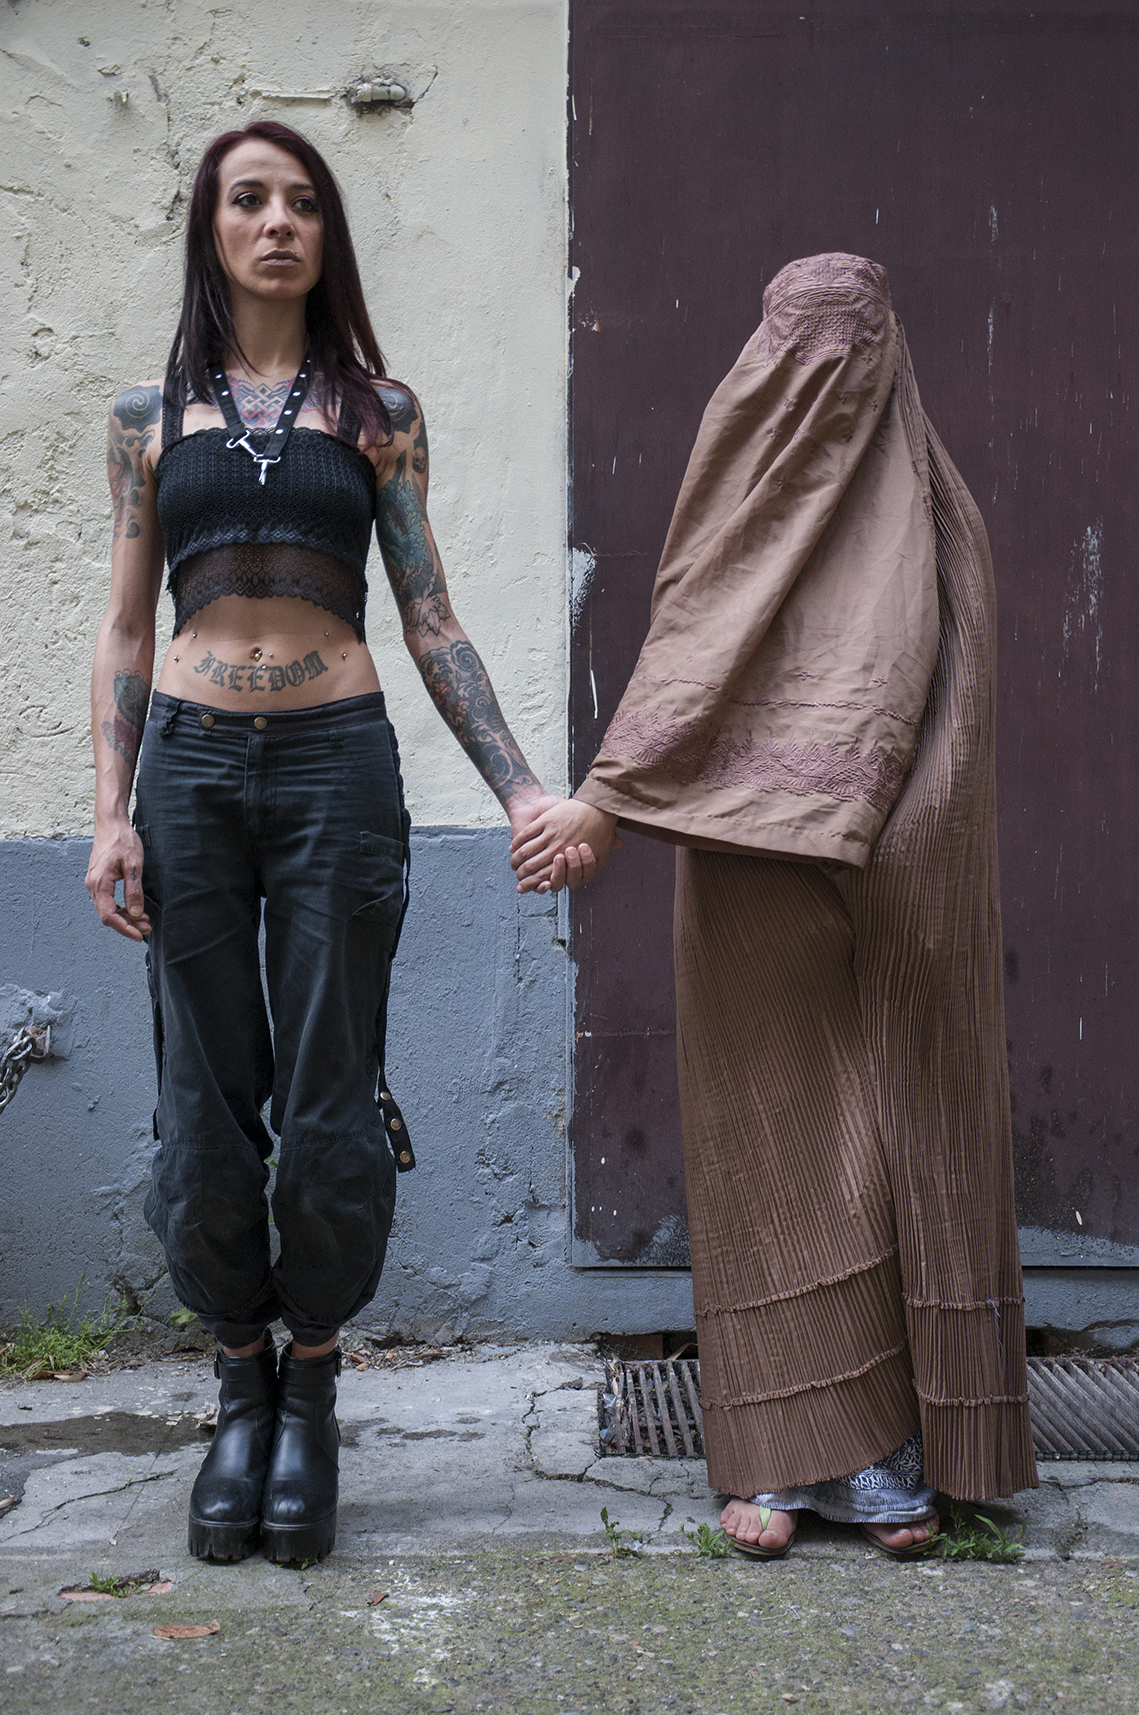 LESBIAN COUPLE II.